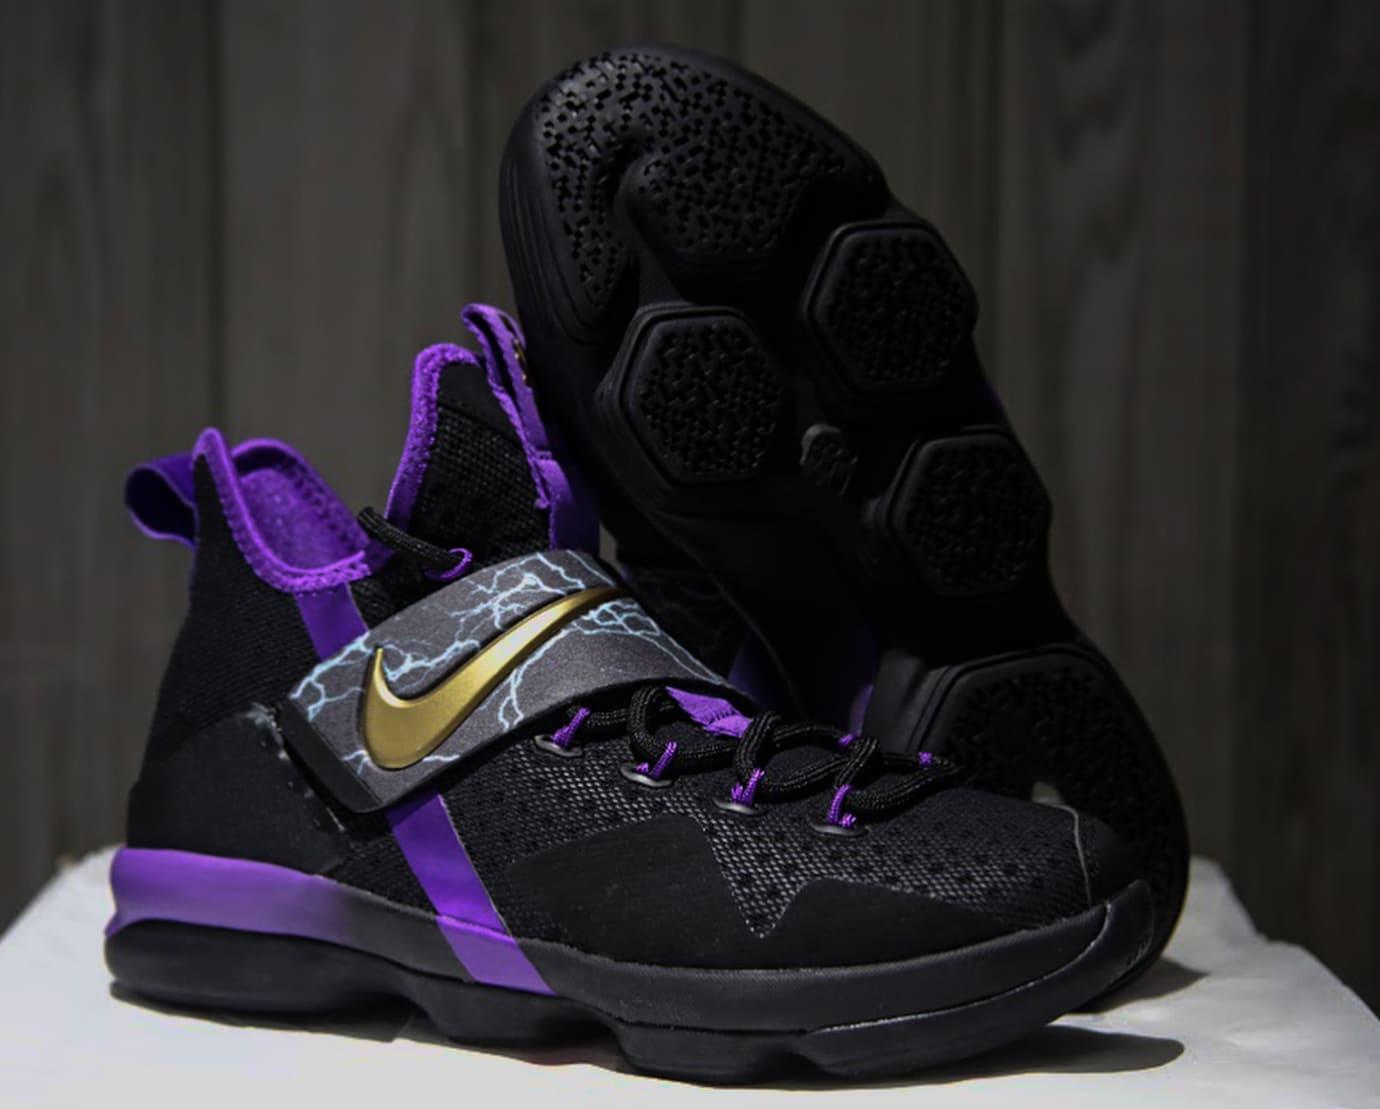 super popular 30409 95f51 Nike LeBron 14 Black Purple Gold Release Date Profile AA3258-590